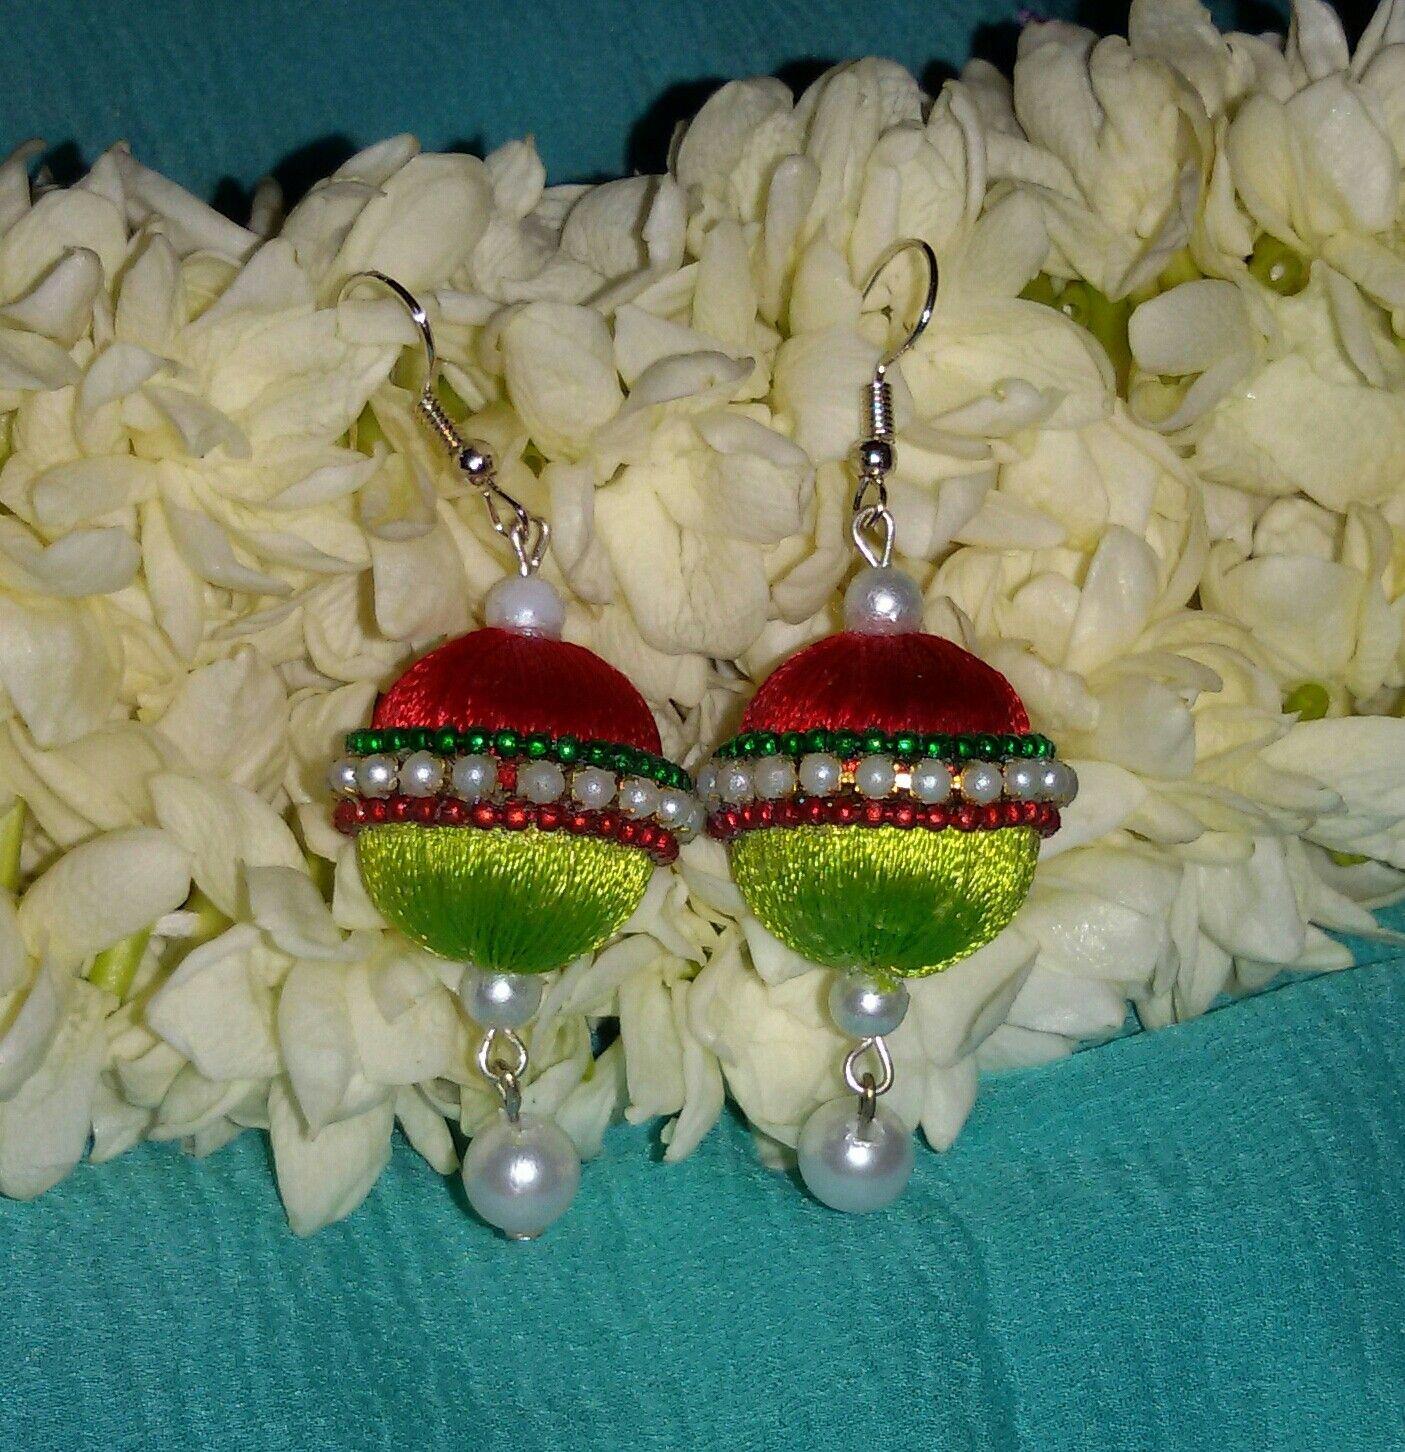 f63cfc361 Red and light green silkthread earrings with pearls and ball chain #silk  #SilkThread #Earrings #indian #Handmade #Jewellery #DIY #Unique #ballchain